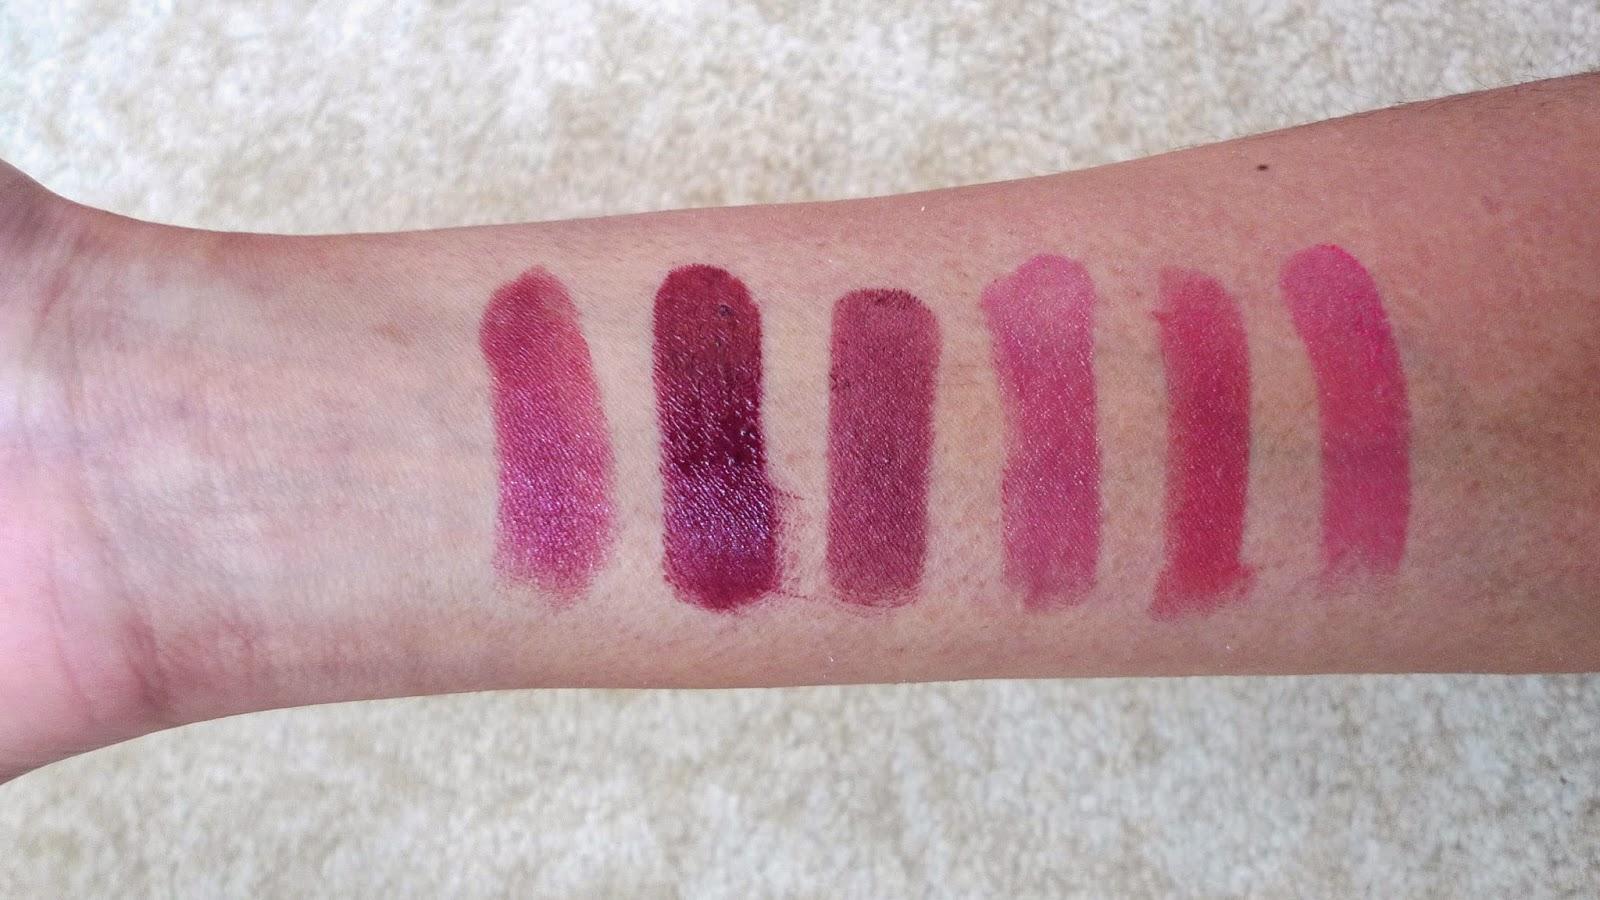 vintage lipstick swatches: Milani, rimmel, l'oreal, avon, pink, revlon lip butter